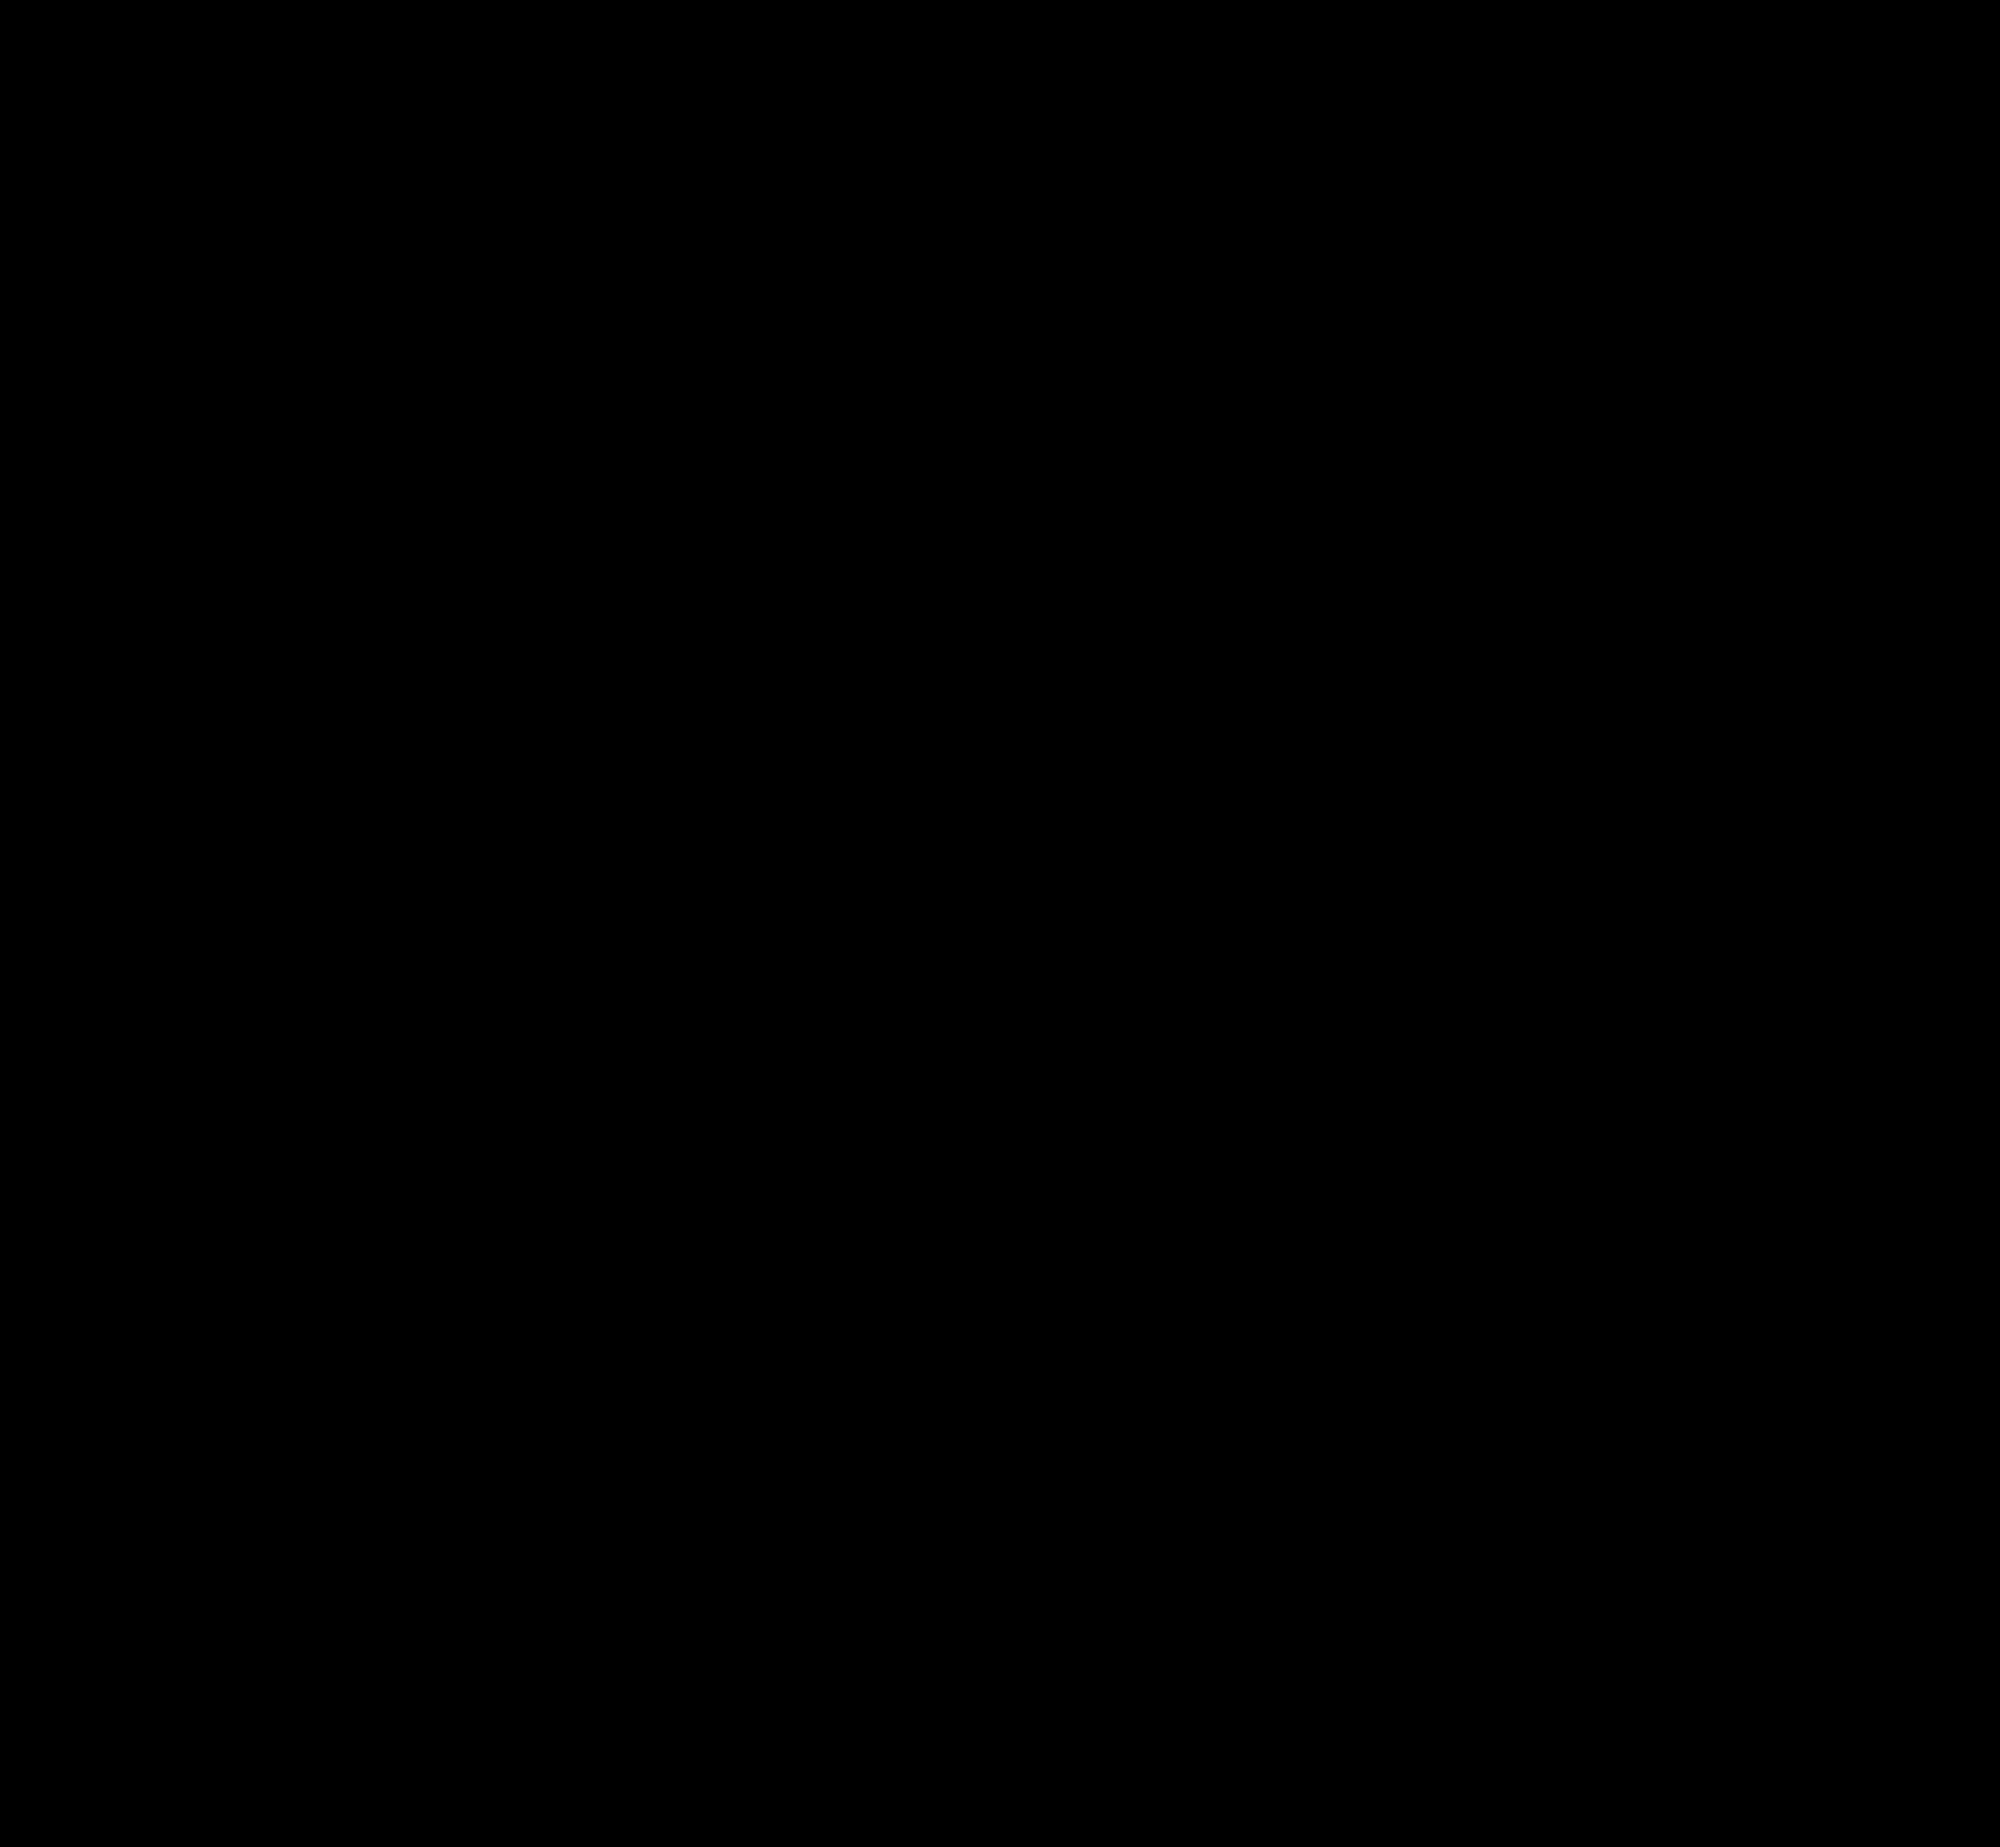 OH NO!-logo-black.png